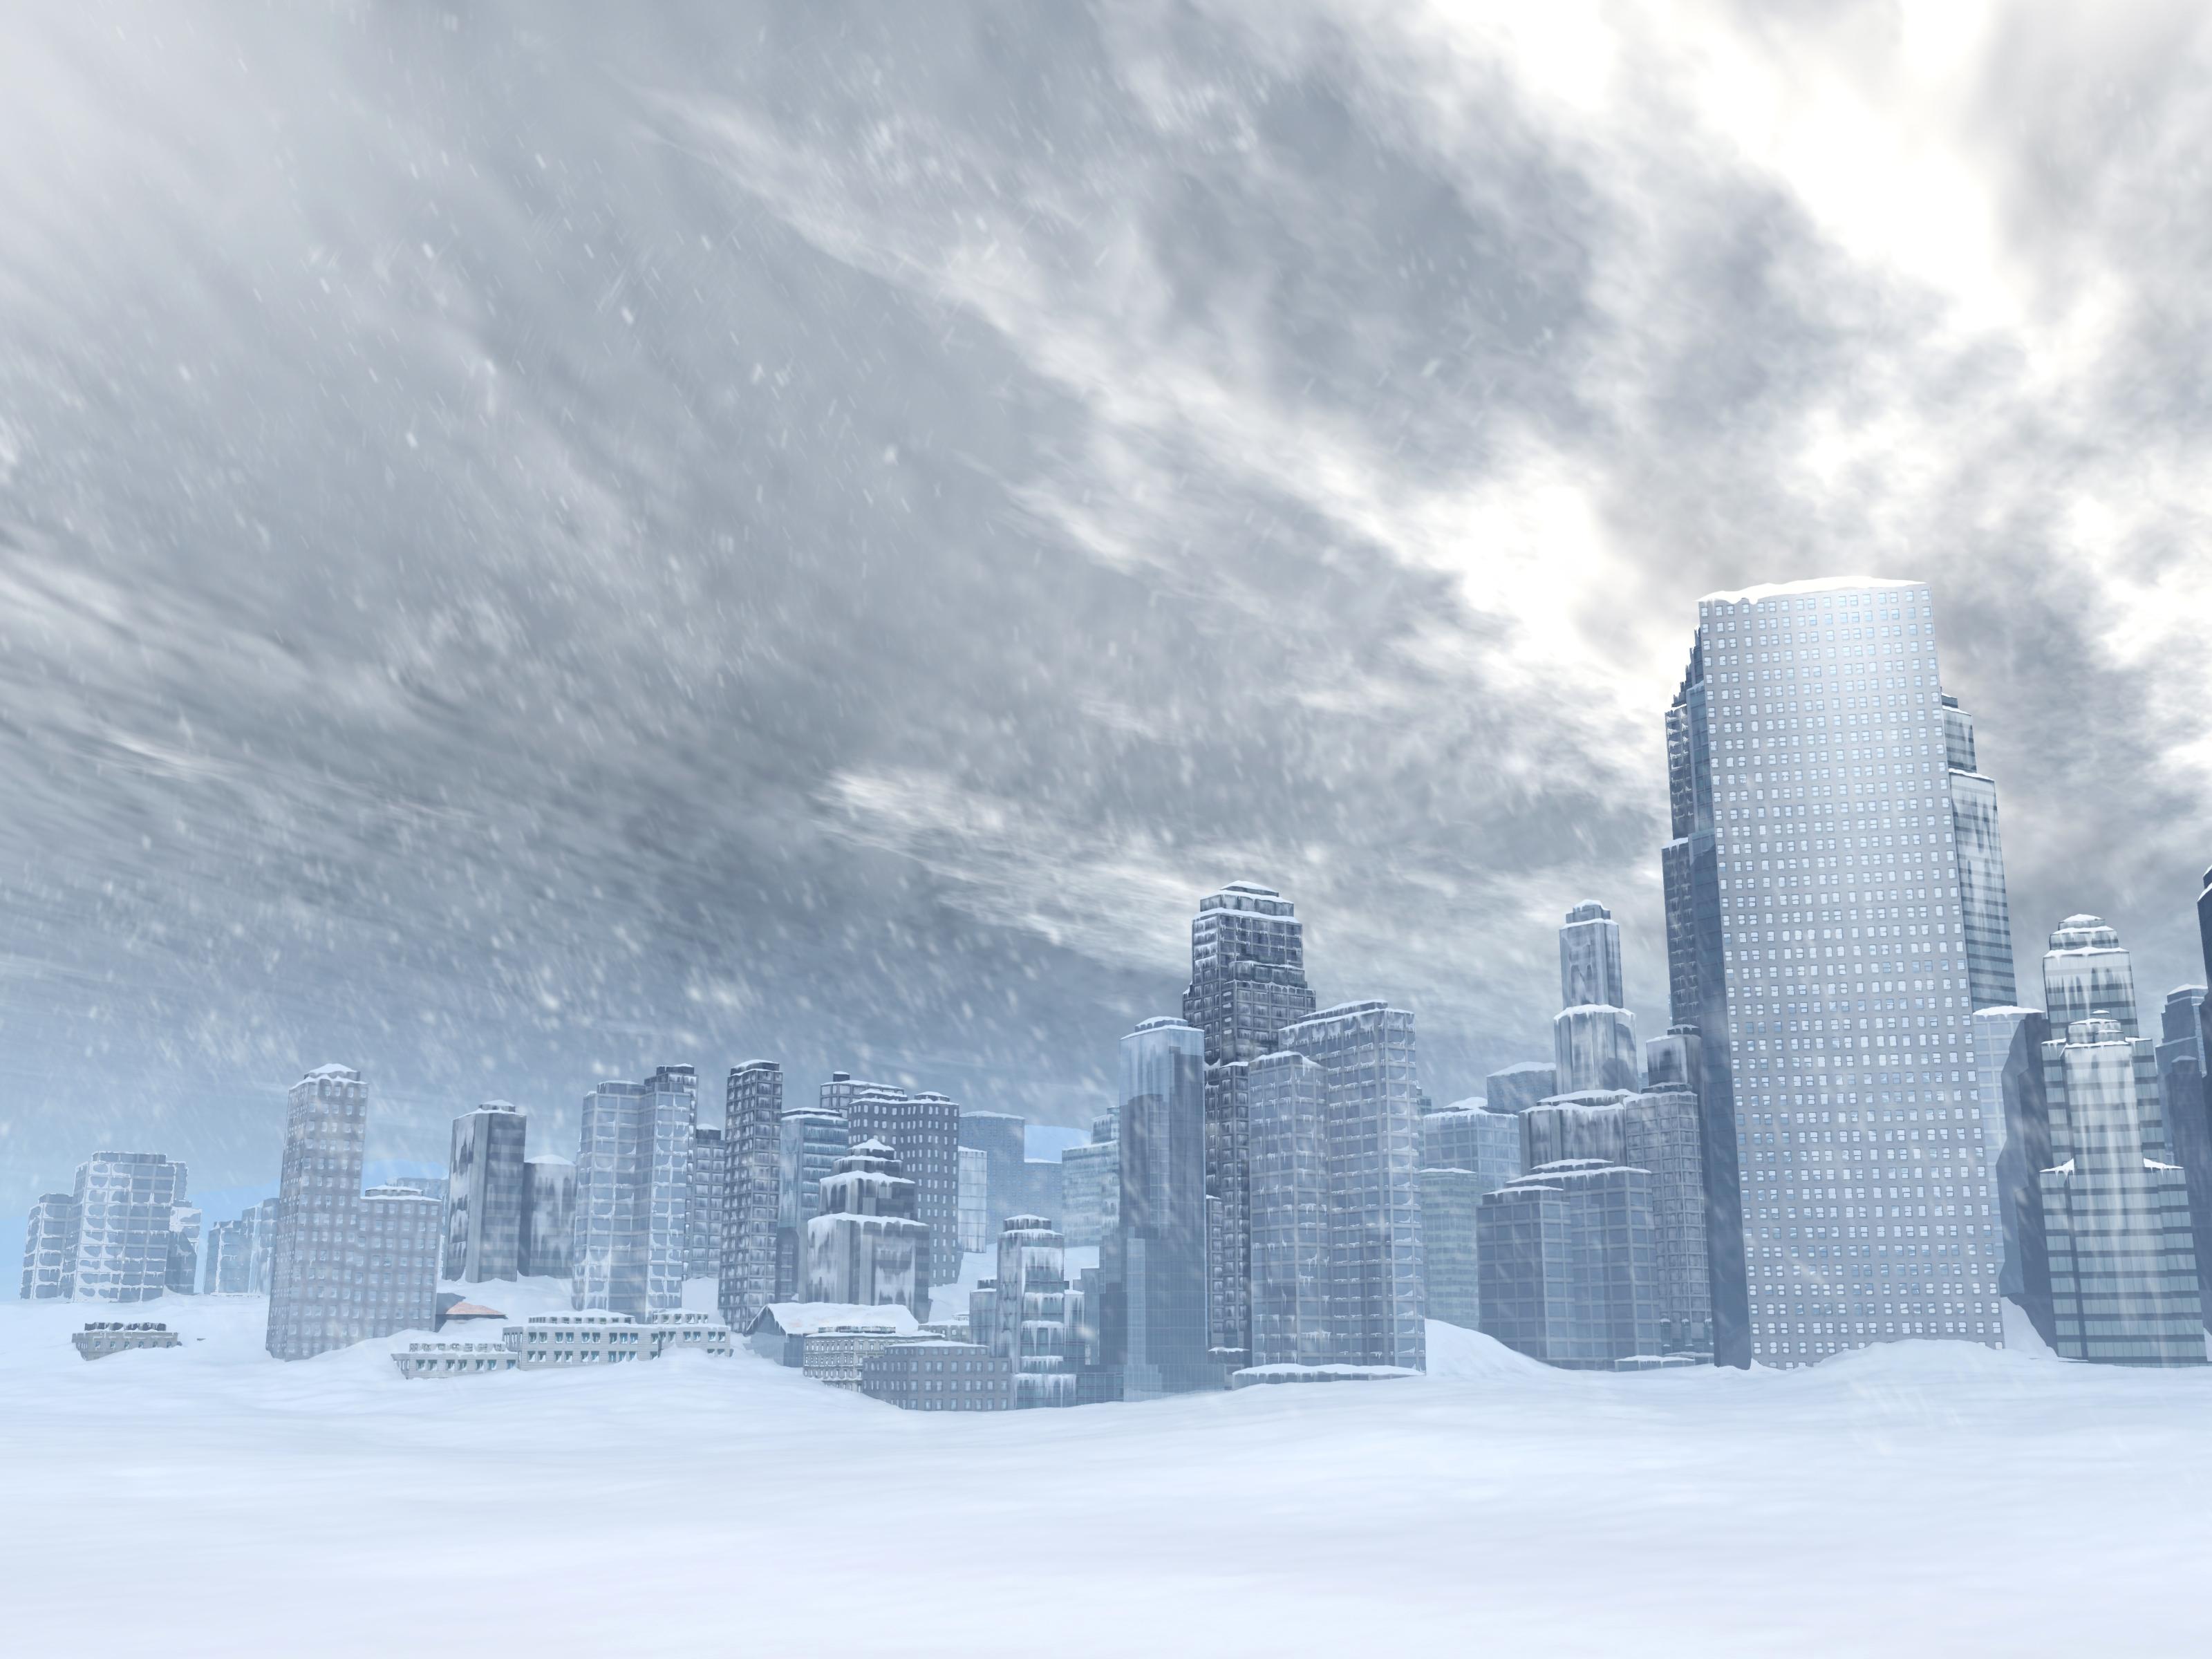 PE1021_snowy-city.jpg